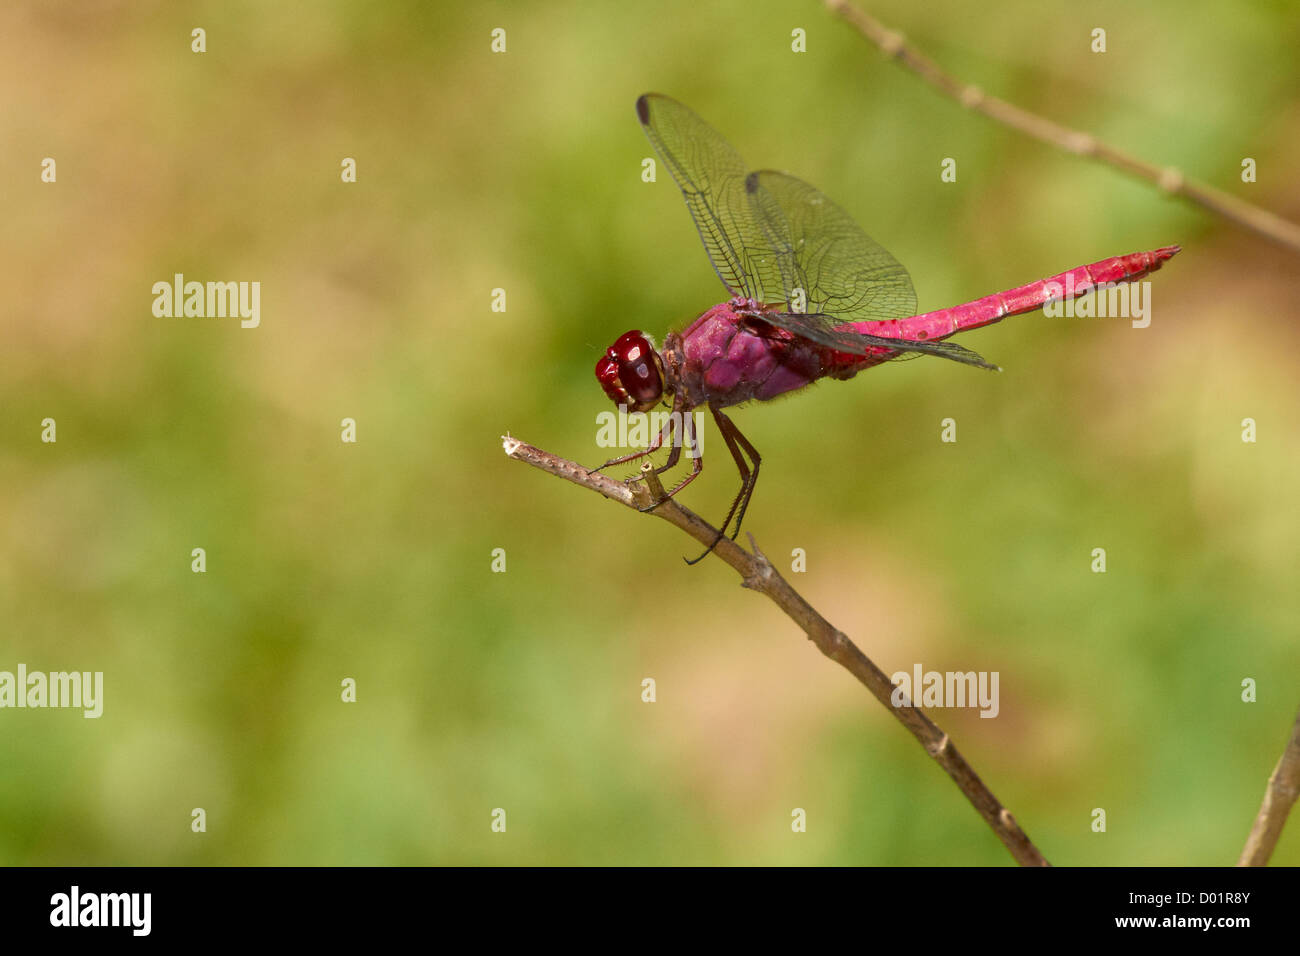 Red libelula on a branch - Stock Image